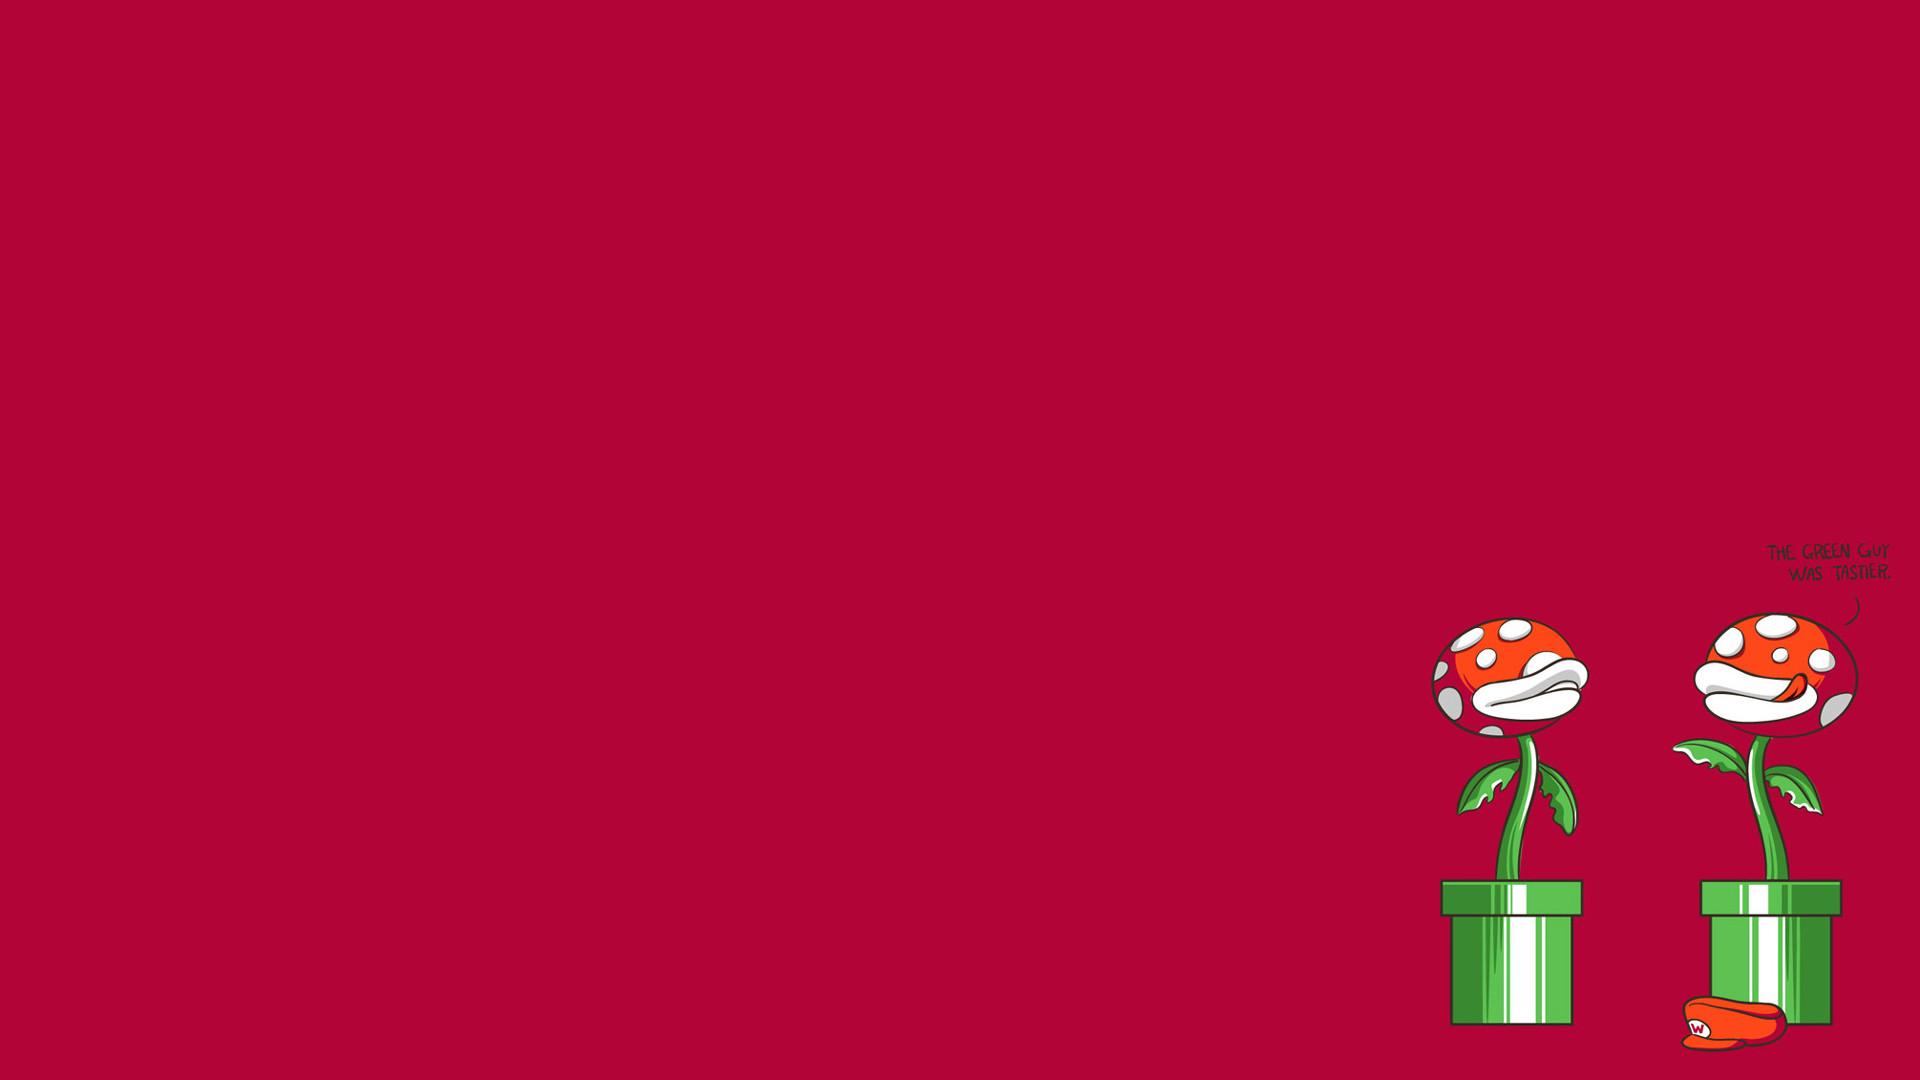 Res: 1920x1080, cartoons, minimalistic, Mario Bros, funny, mushrooms, plants - Free  Wallpaper / WallpaperJam.com